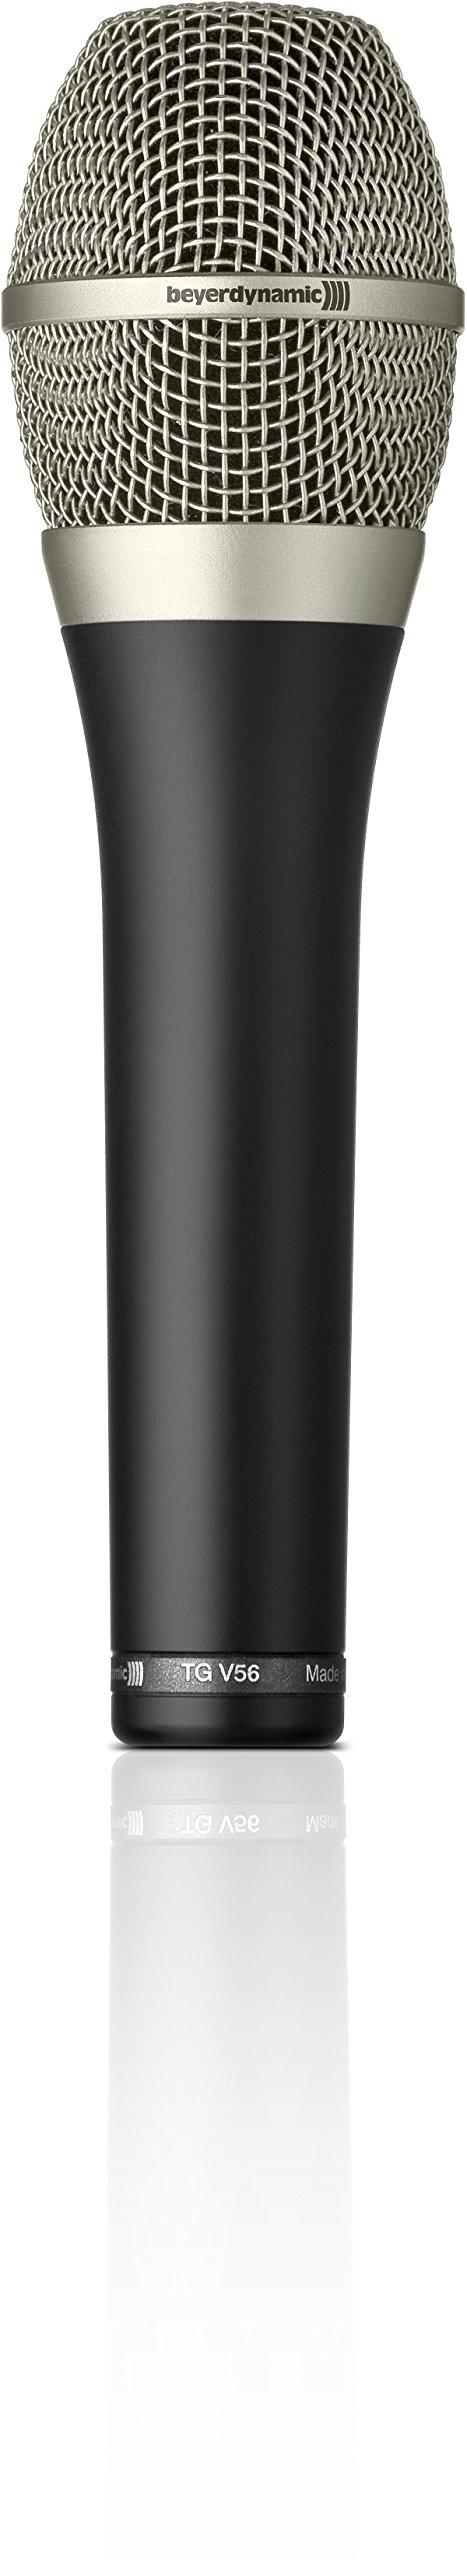 Beyerdynamic TG-V56C Electret Condenser Cardioid Microphone for Vocals